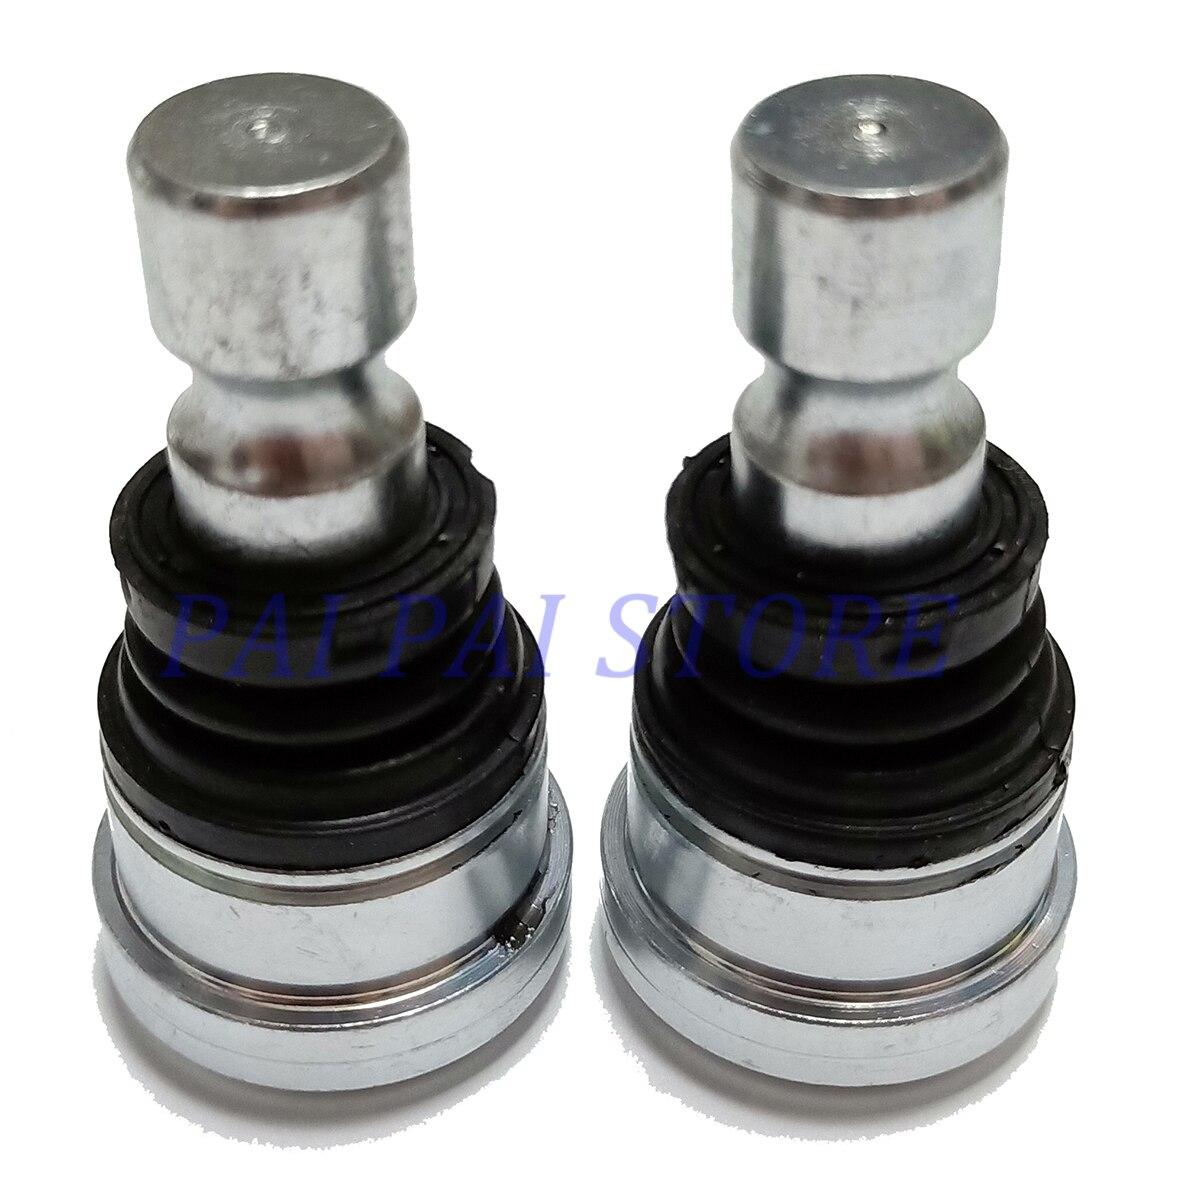 2pcs High Quality Ball Joint For Polaris 7061220 2014-2018 Sportsman 1000 XP RZR 570 800 900